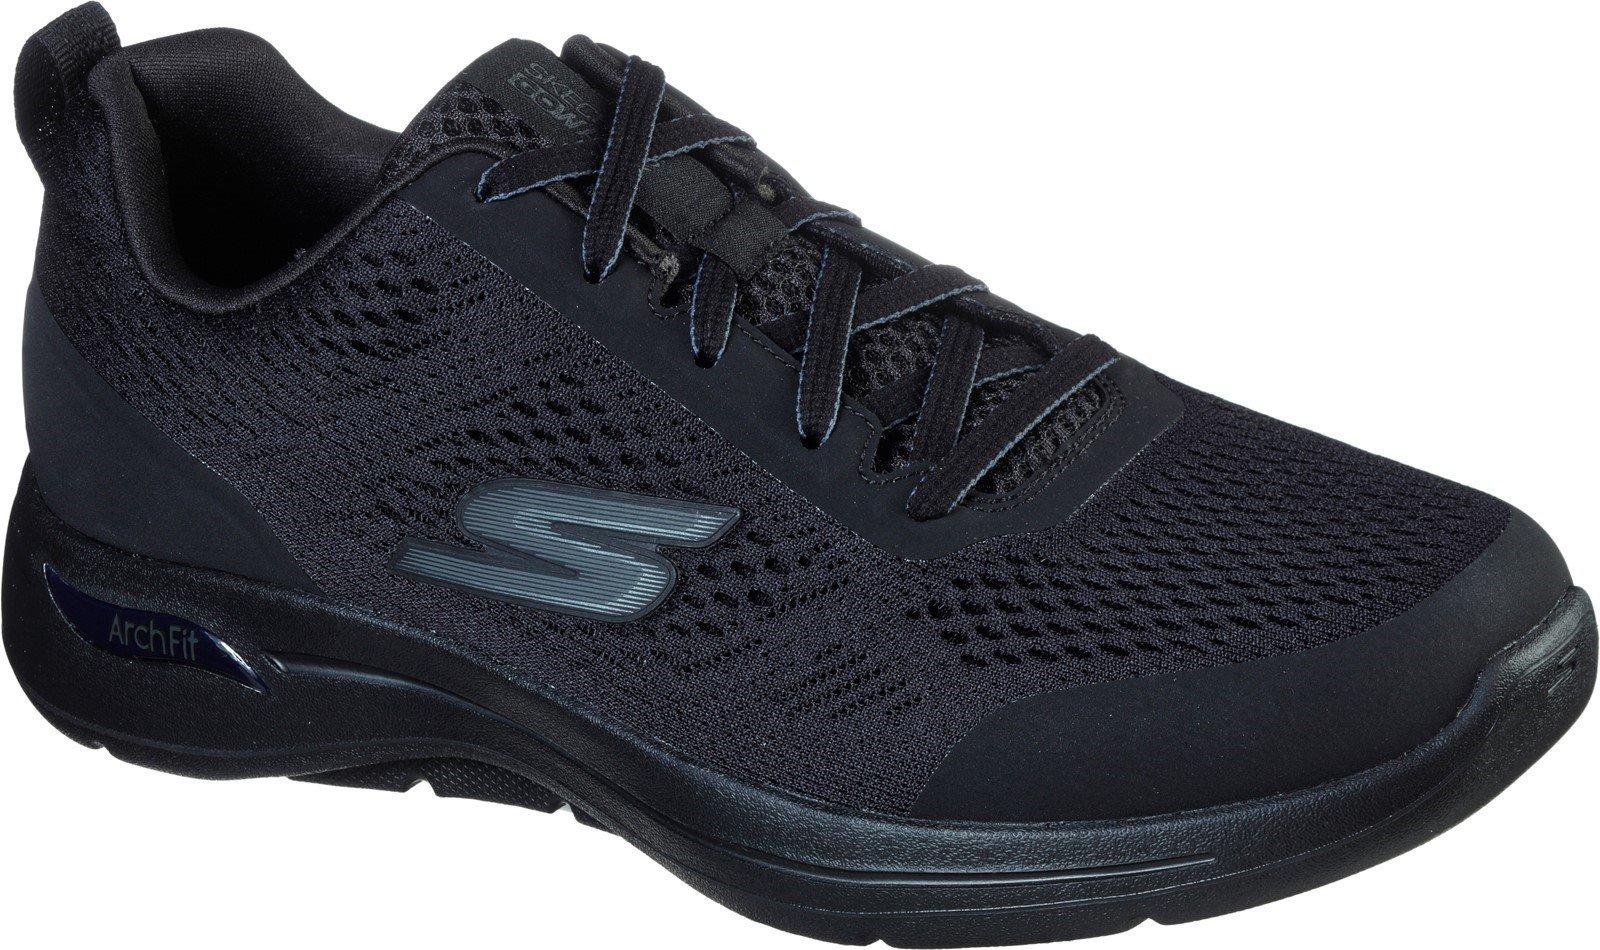 Skechers Men's Go Walk Arch Fit Idyllic Sports Trainer Various Colours 32202 - Black/Black 6